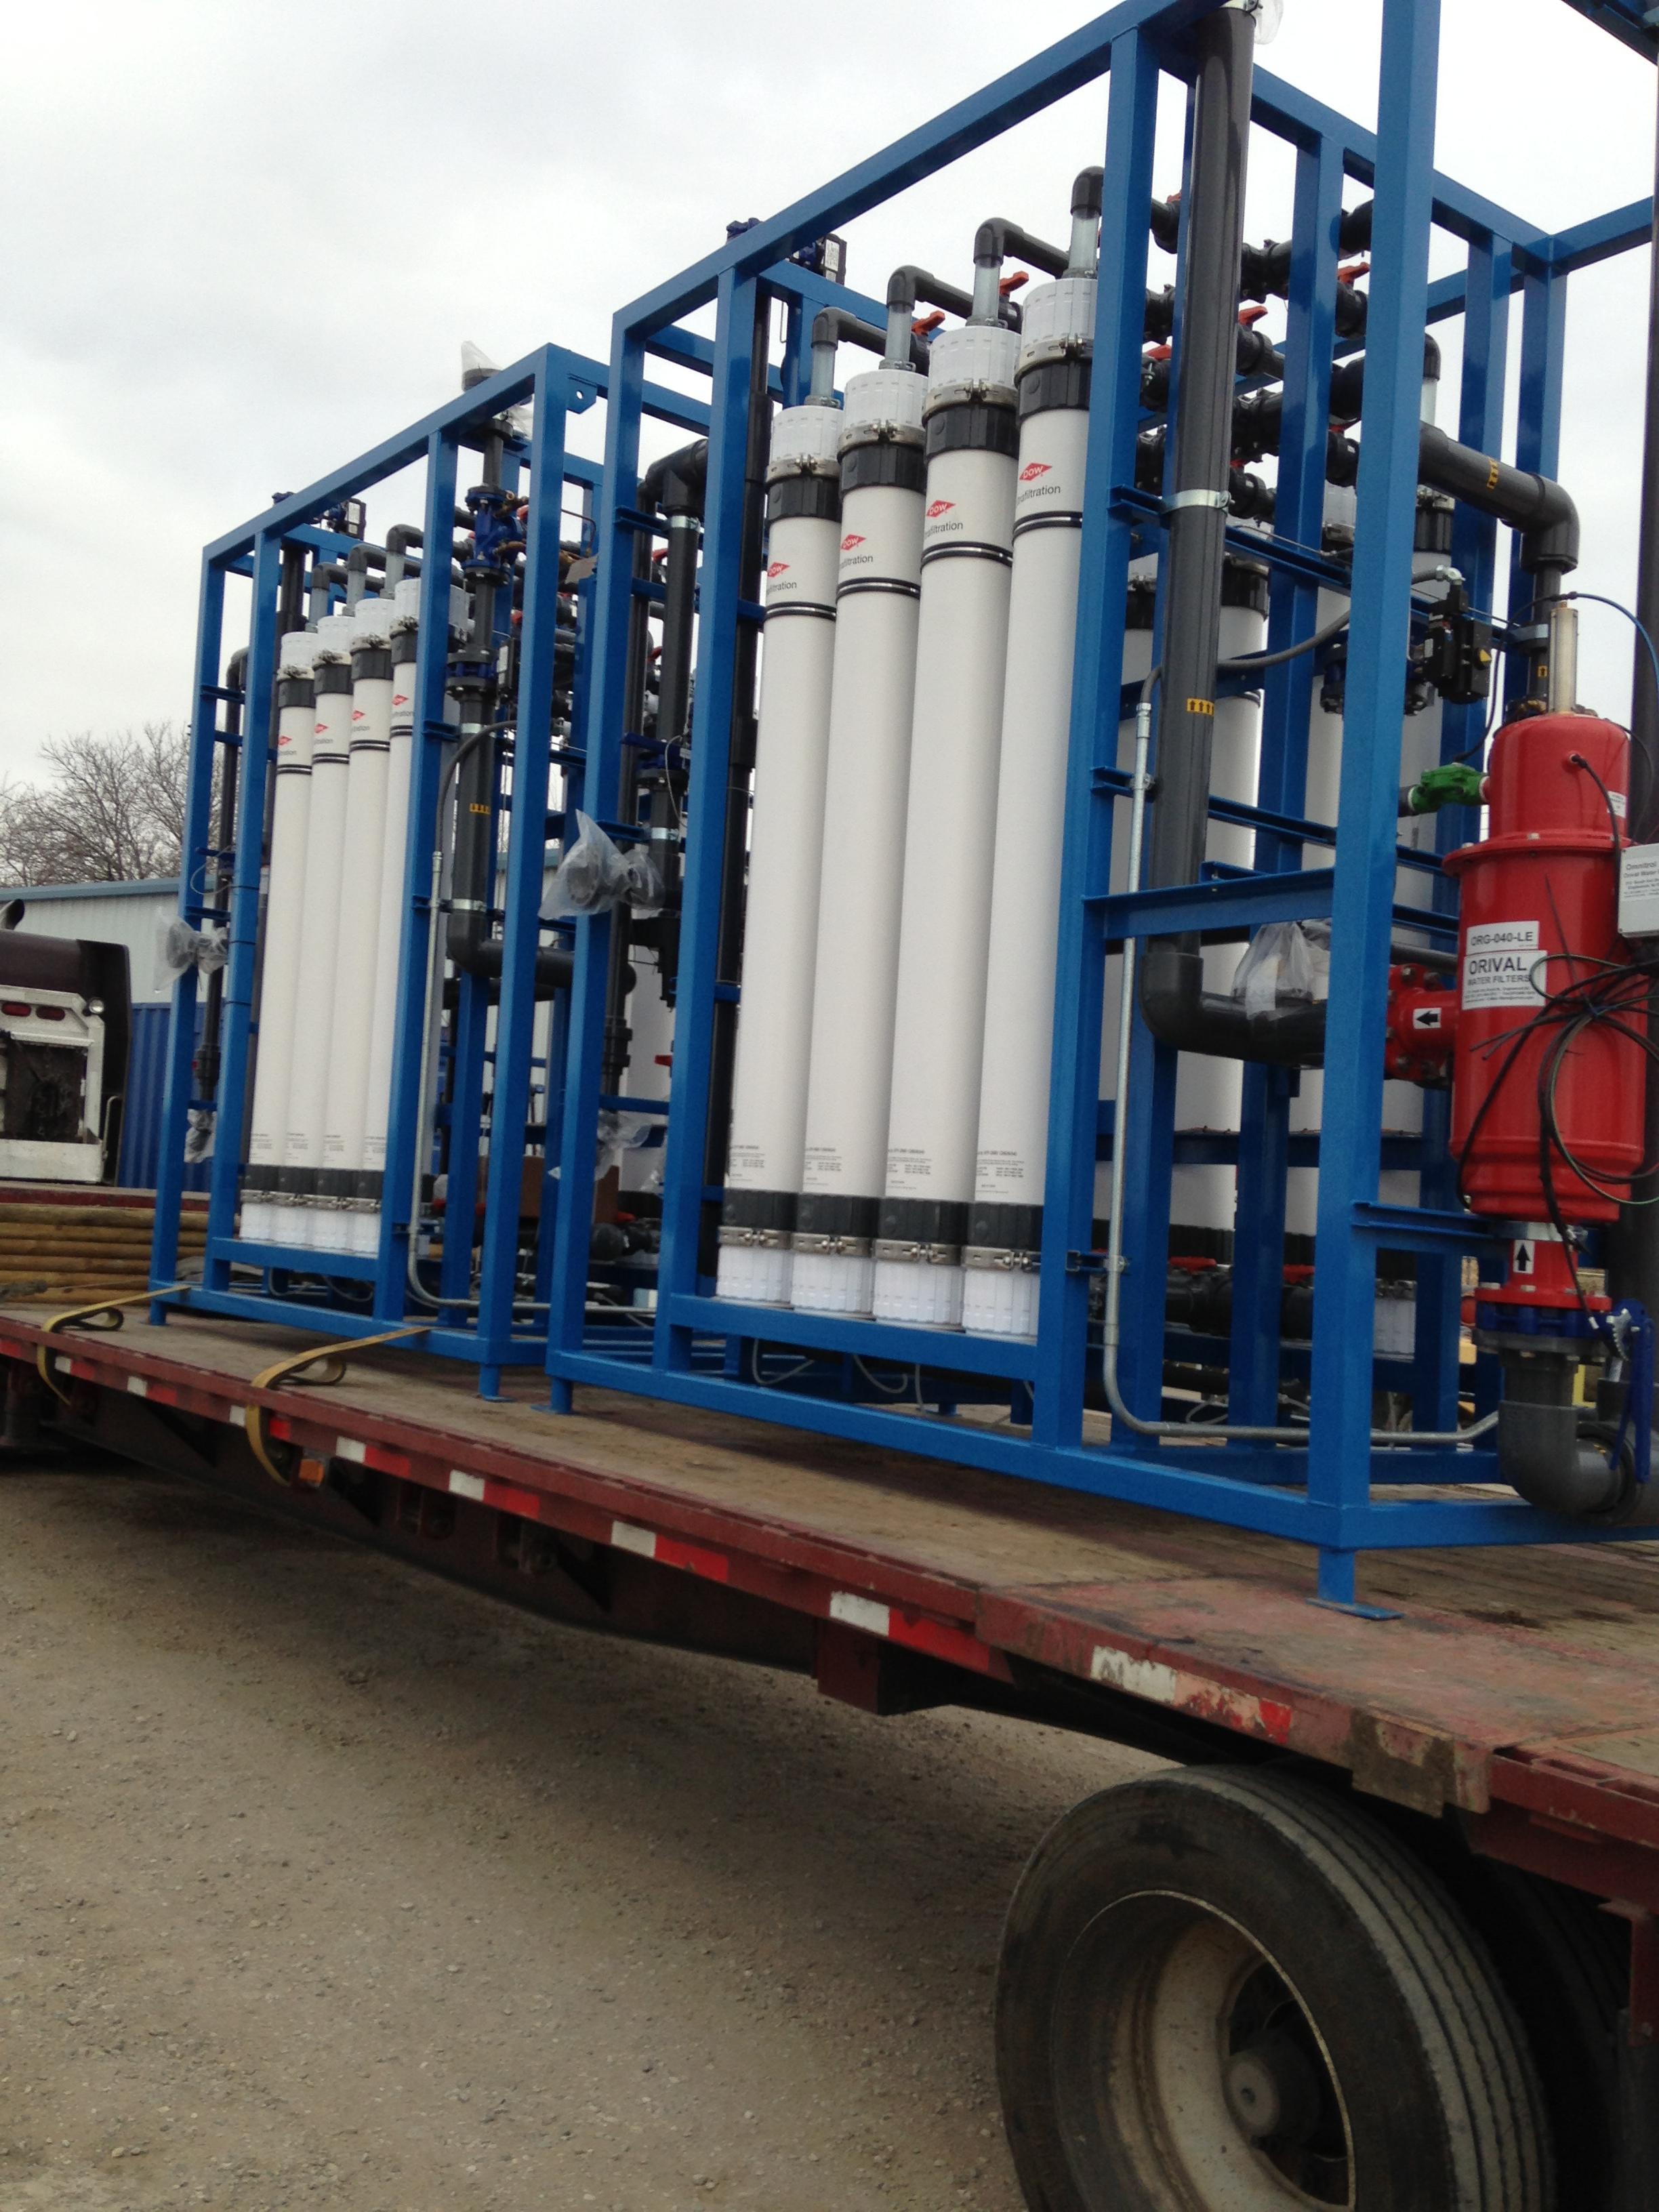 Ultrafiltration Uf Systems Progressive Water Treatment